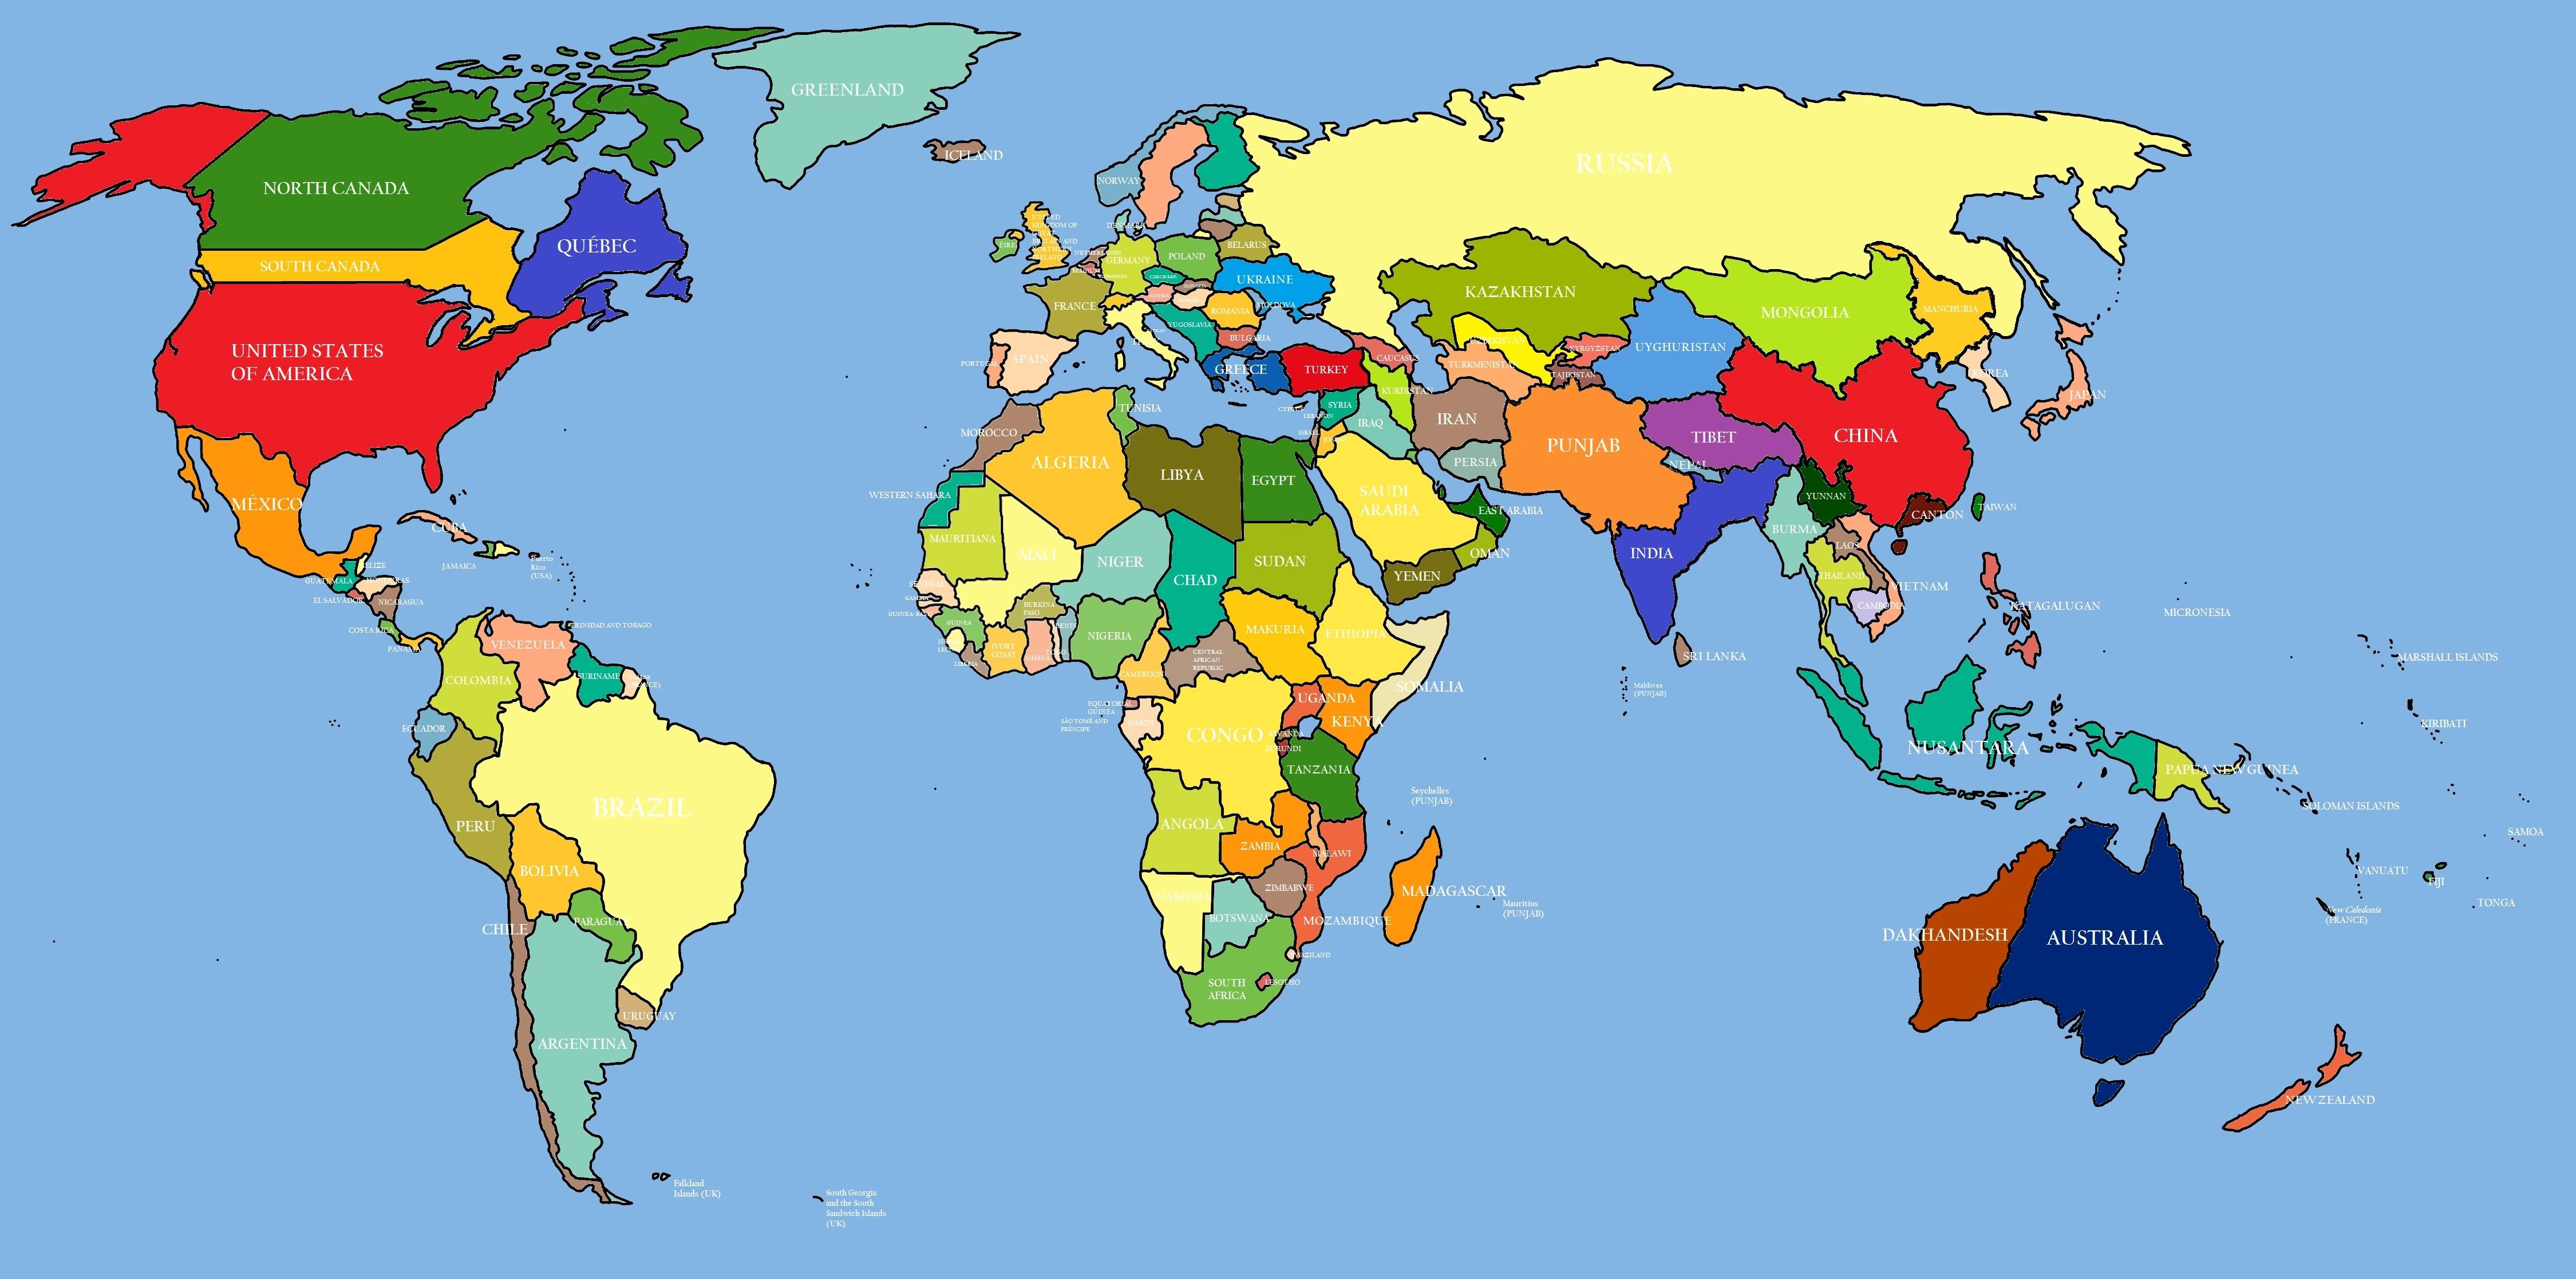 World Map | Maps of the World - World Maps